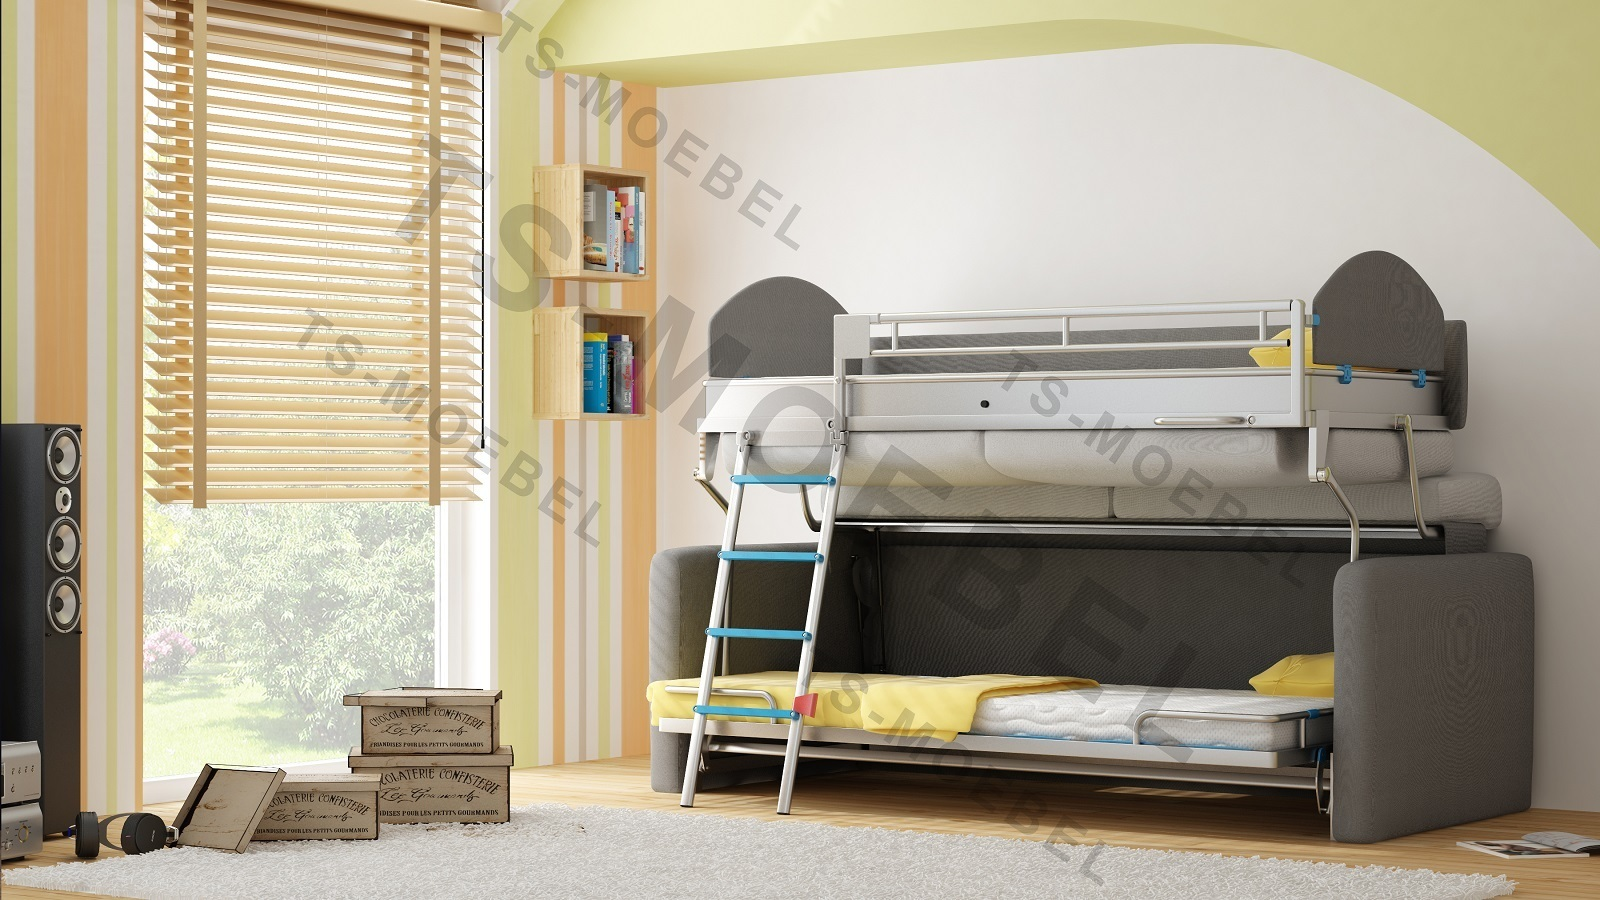 ts m bel wall bed duo sofa mit etagenbett inkl matratzen neu. Black Bedroom Furniture Sets. Home Design Ideas